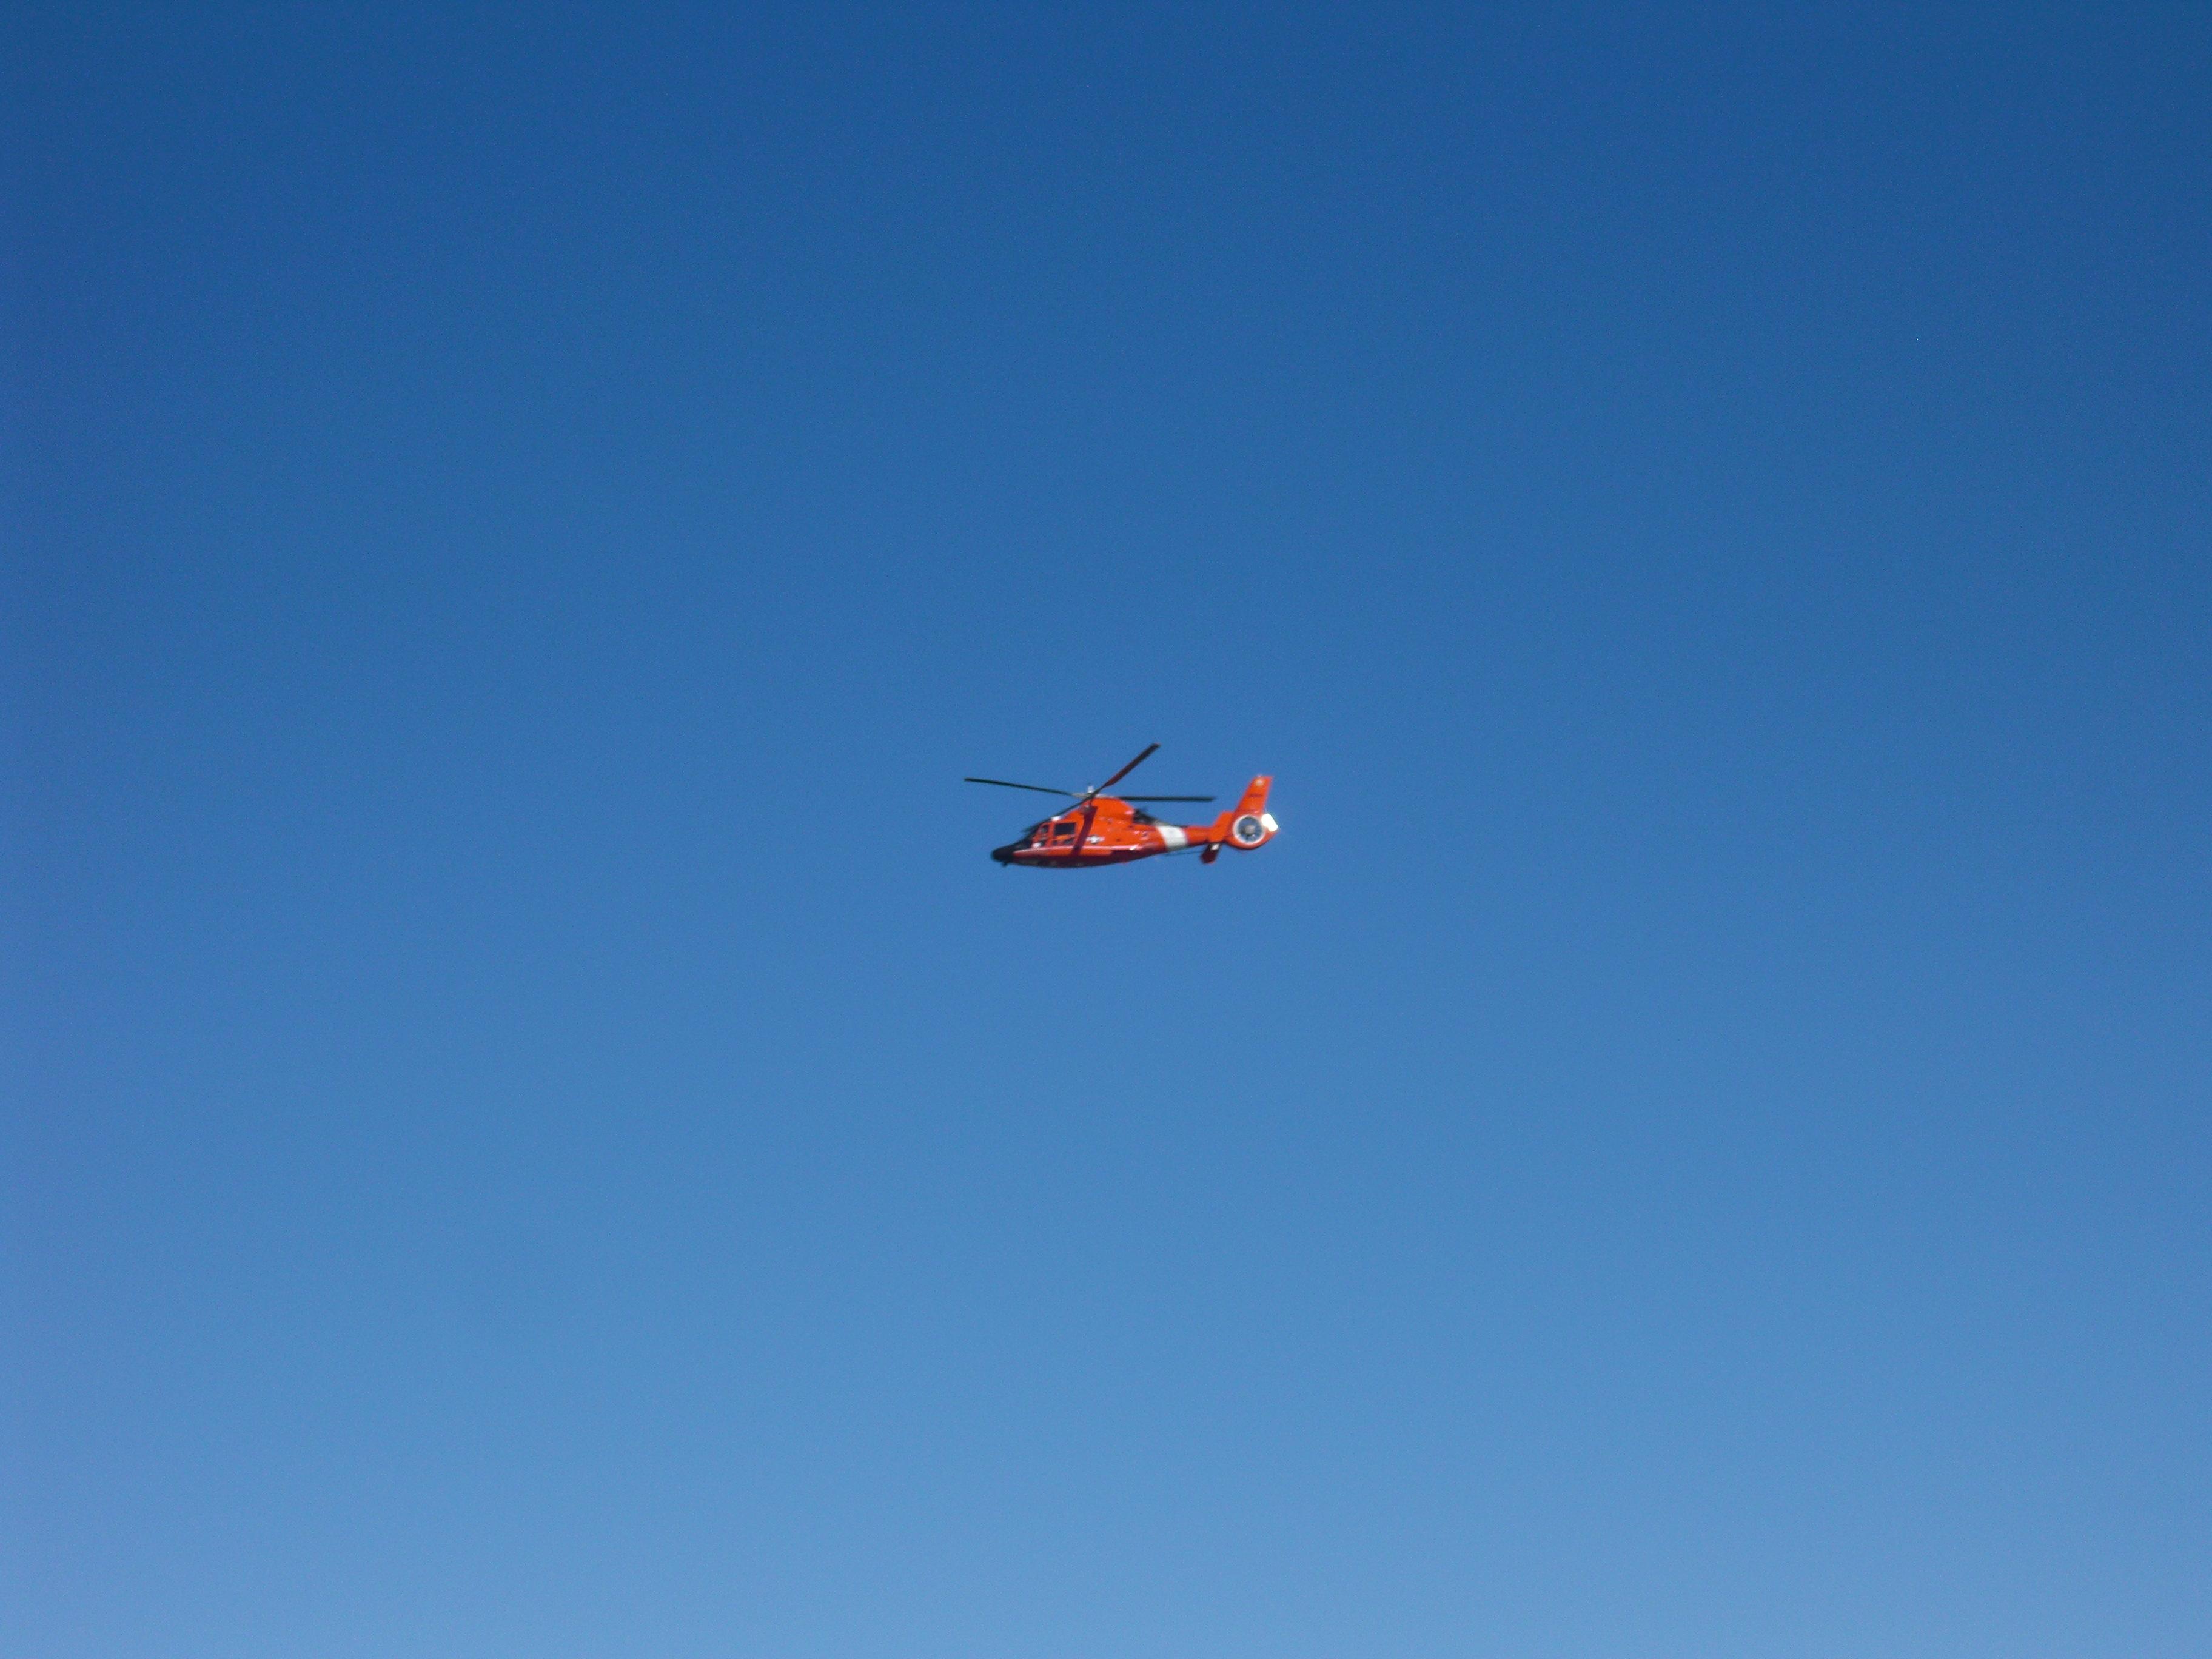 California, Helicopter, Rescue, Sanfrancisco, Heli, HQ Photo